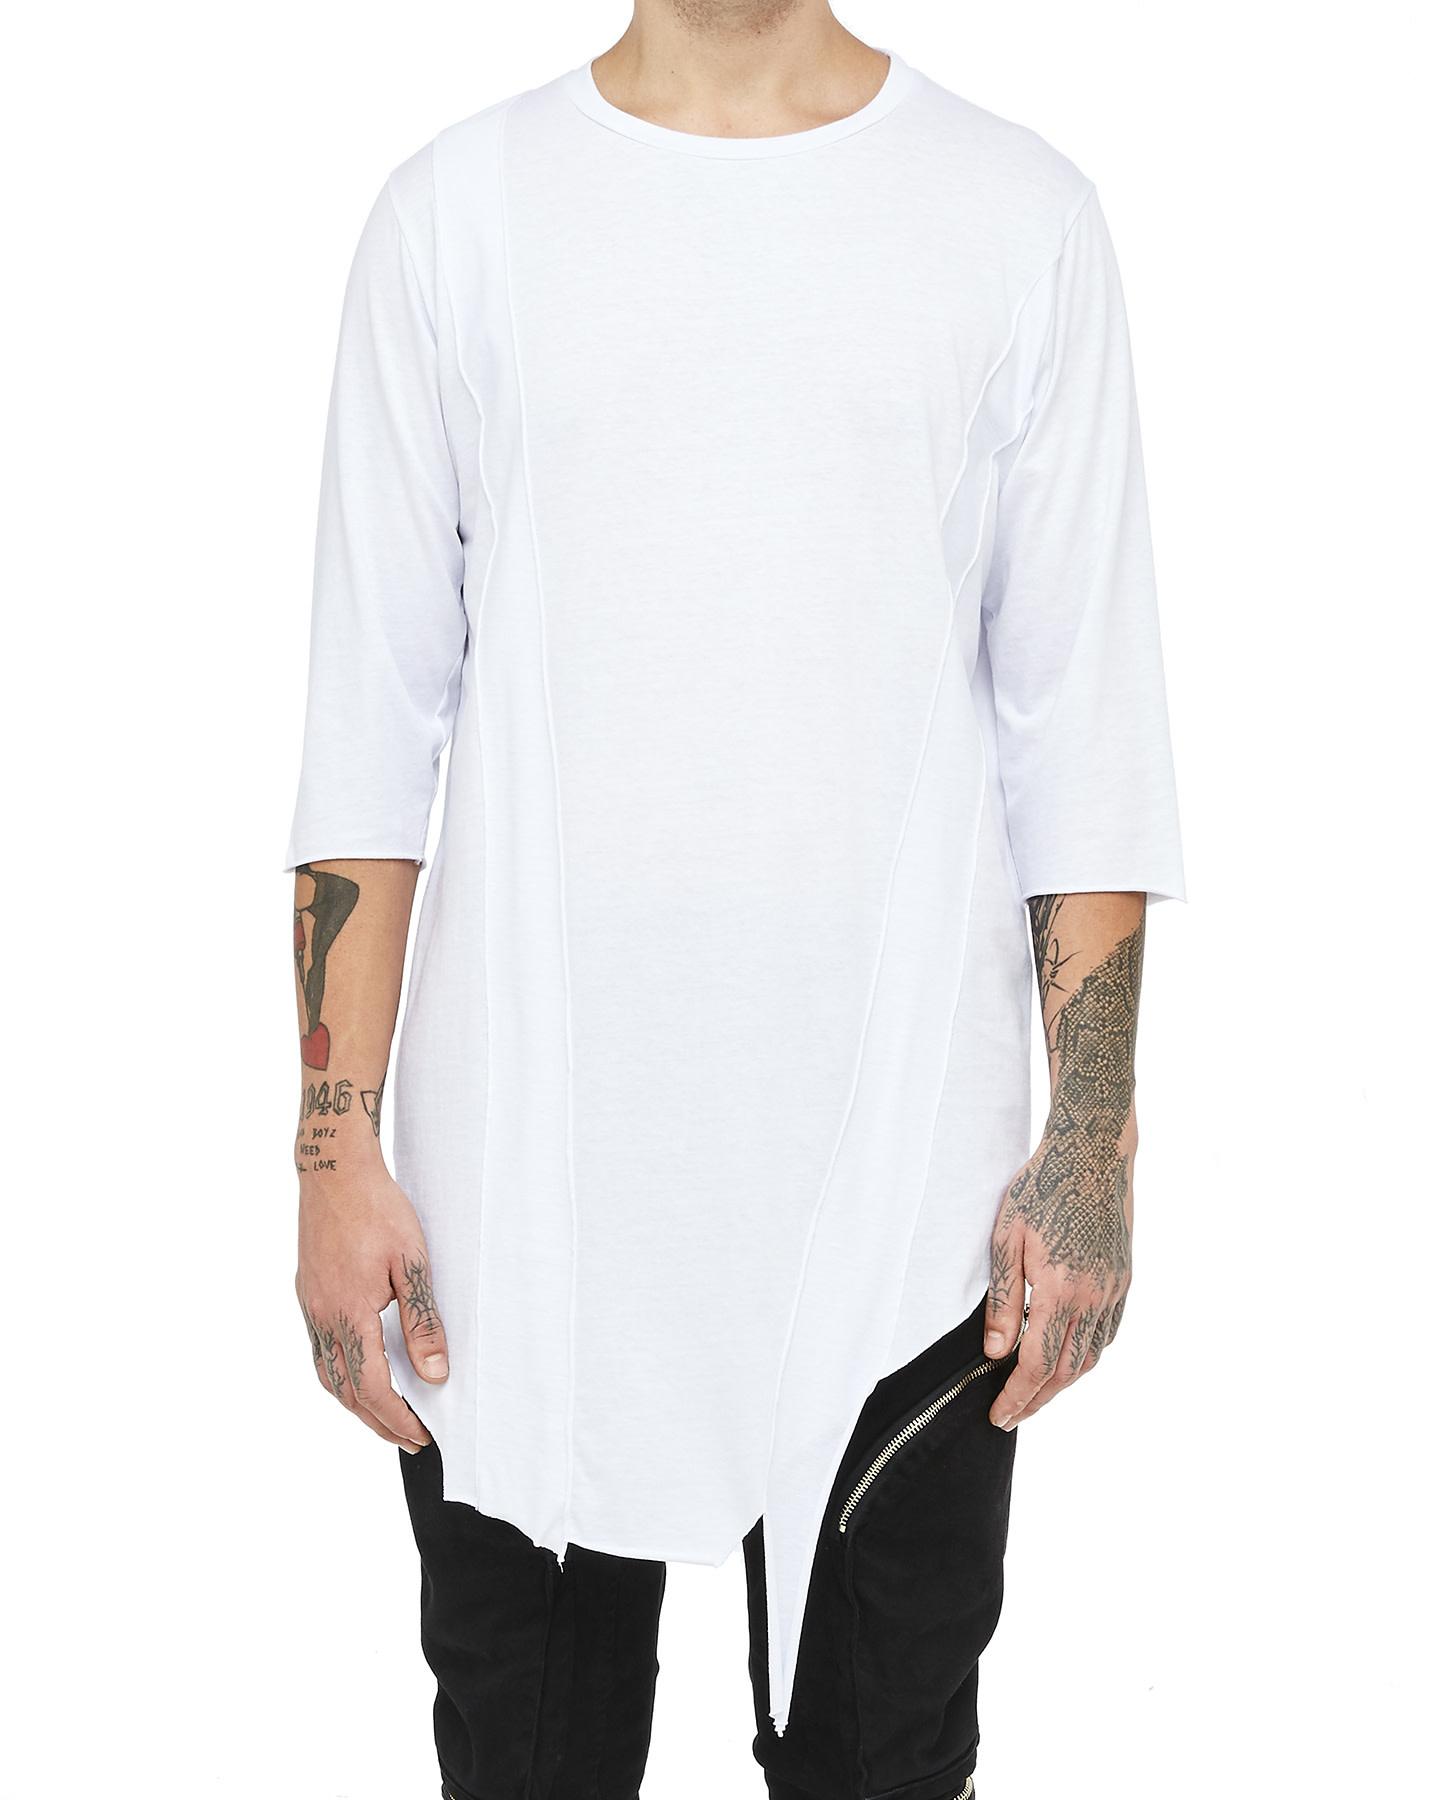 LONG BANDED T-SHIRT - WHITE